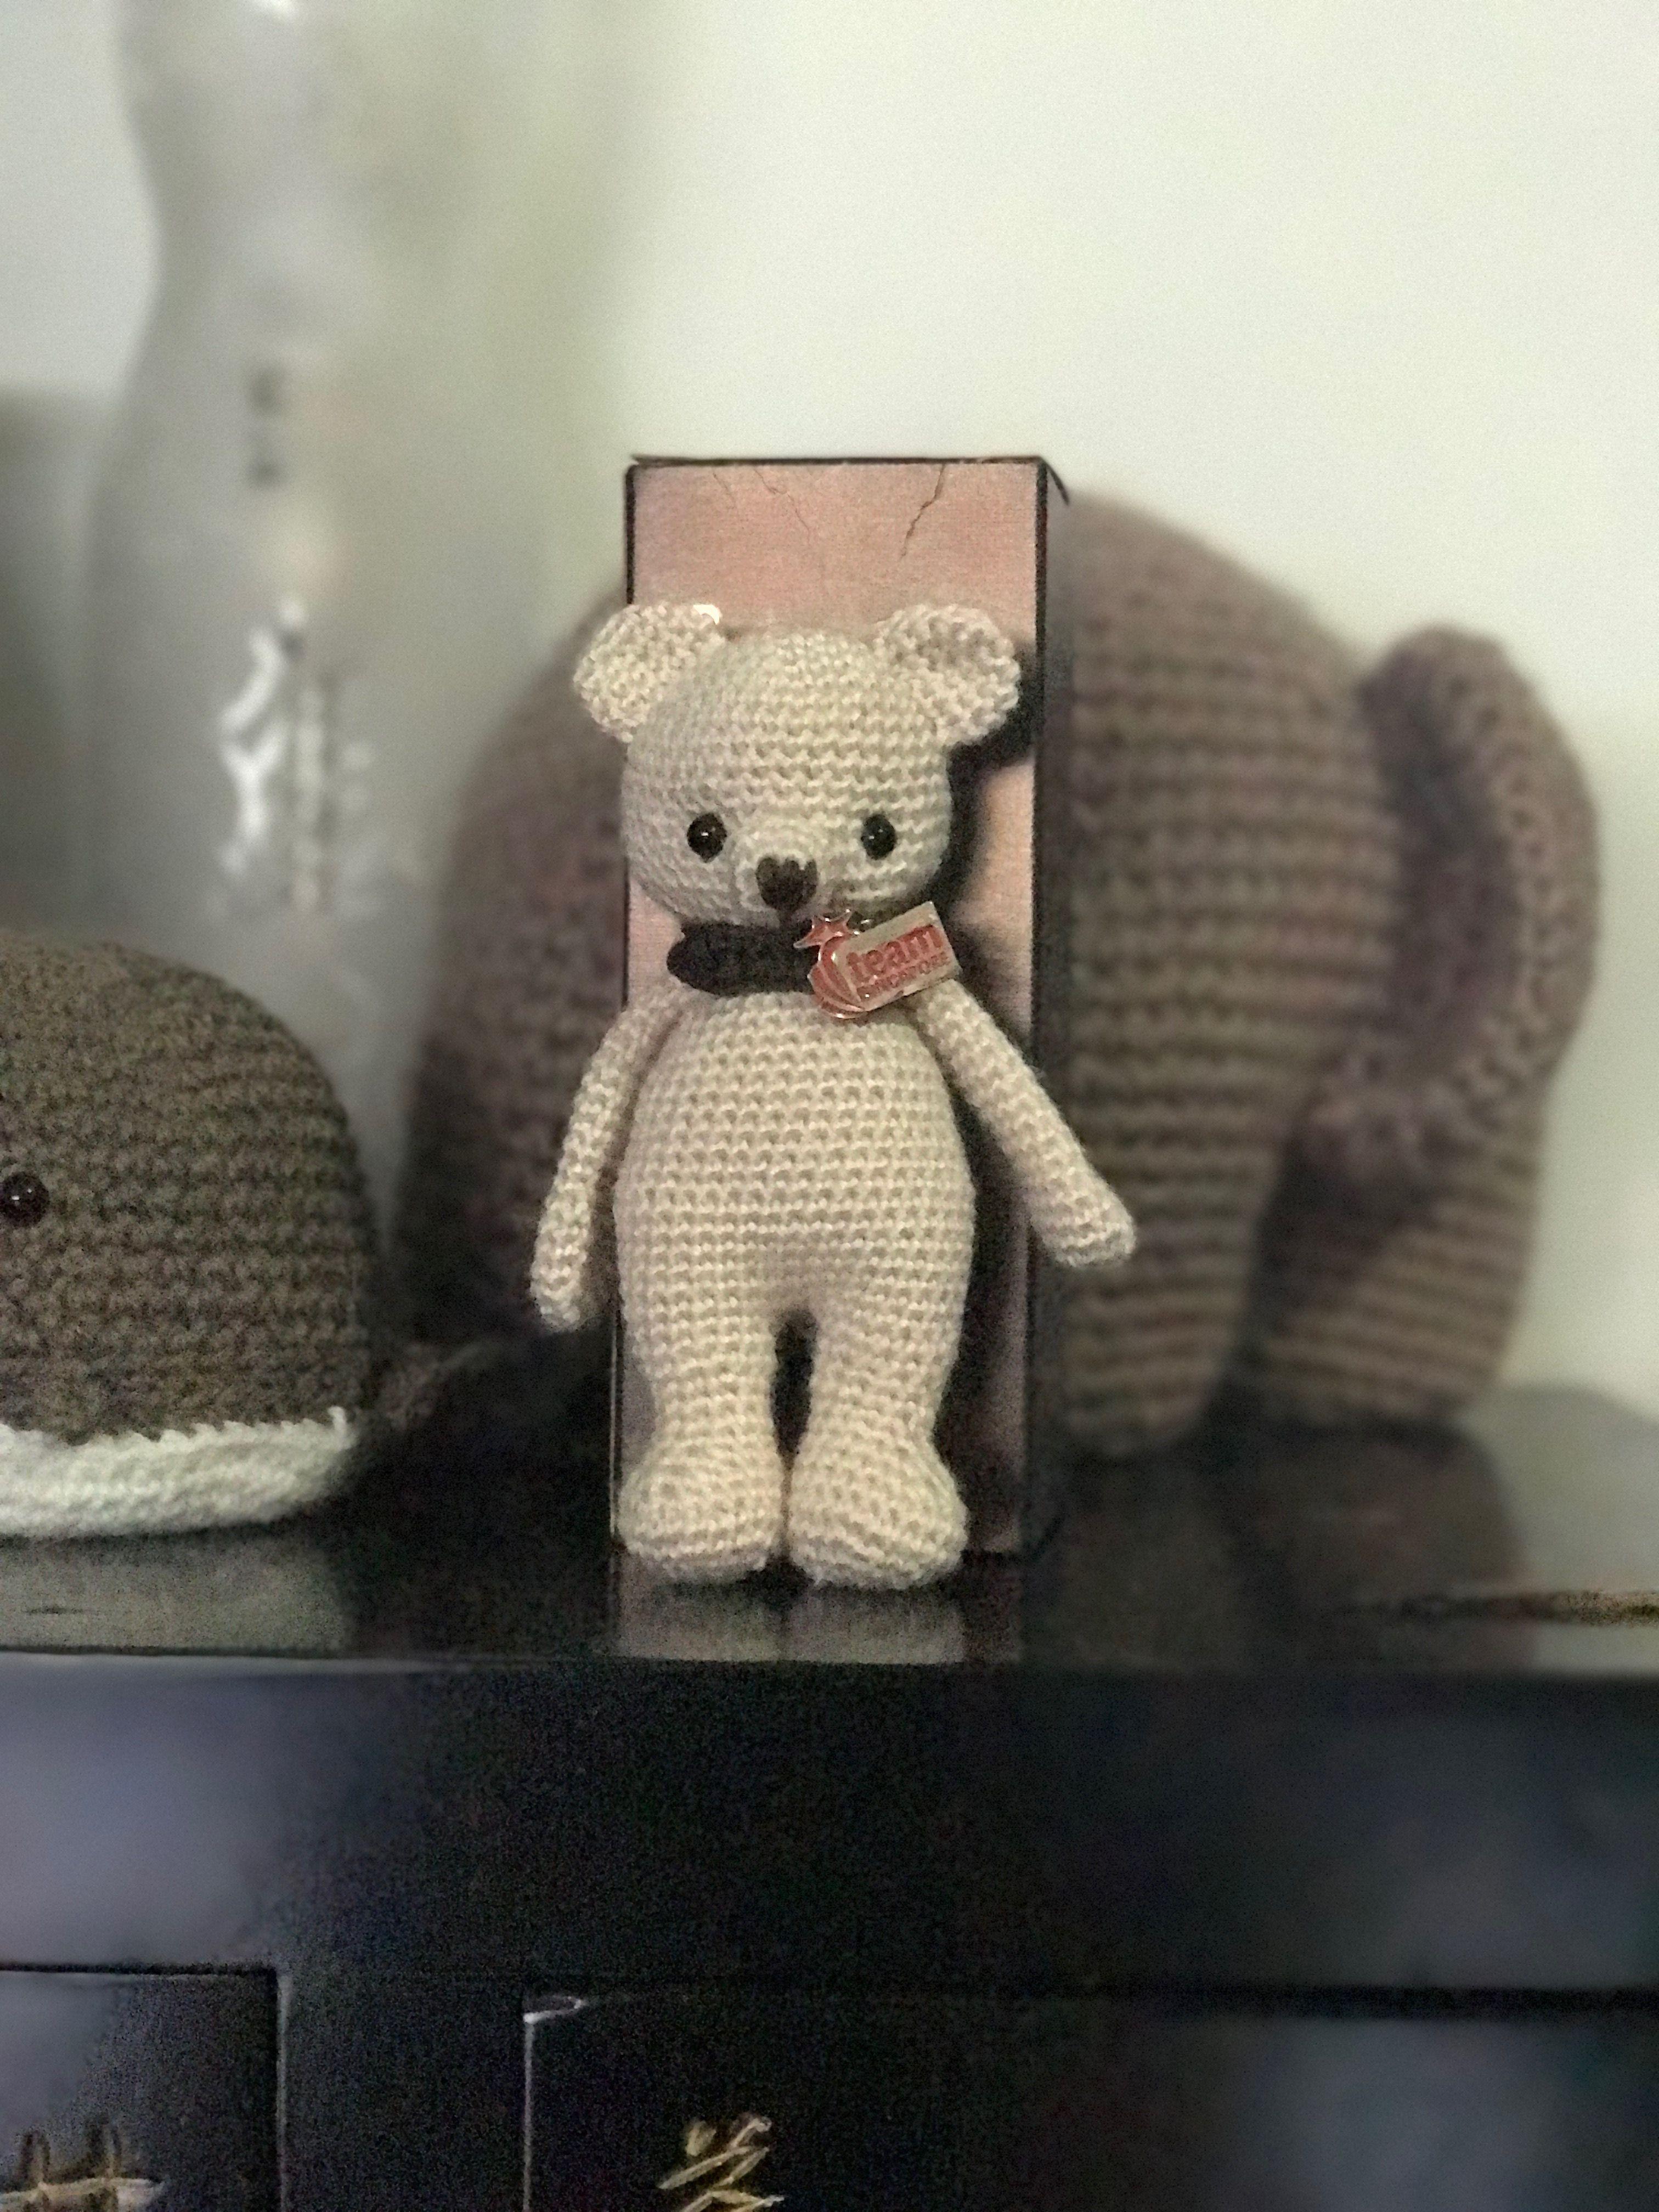 Cuddle Me Bear amigurumi pattern - Amigurumi Today | 4032x3024